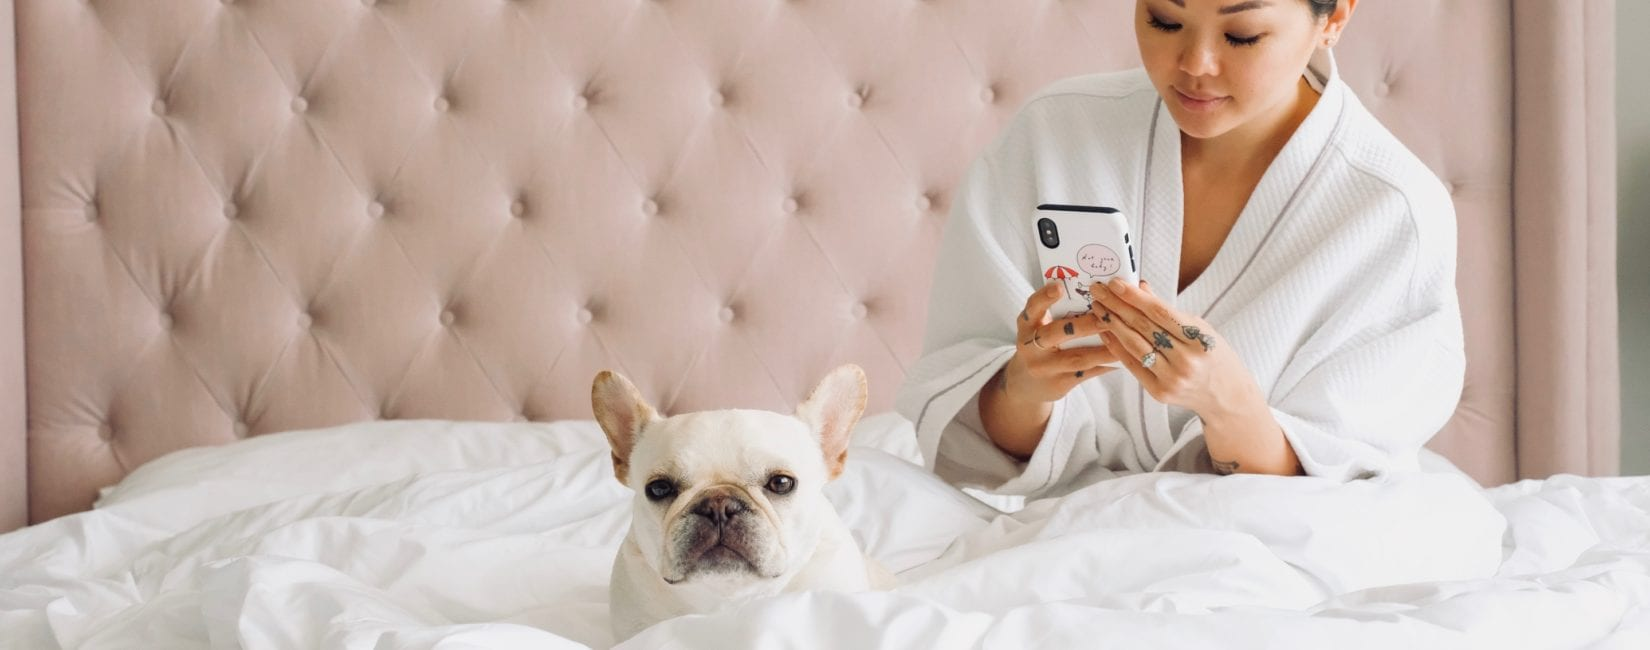 The Most Instagrammable Spots: Nolita/Soho New York Edition